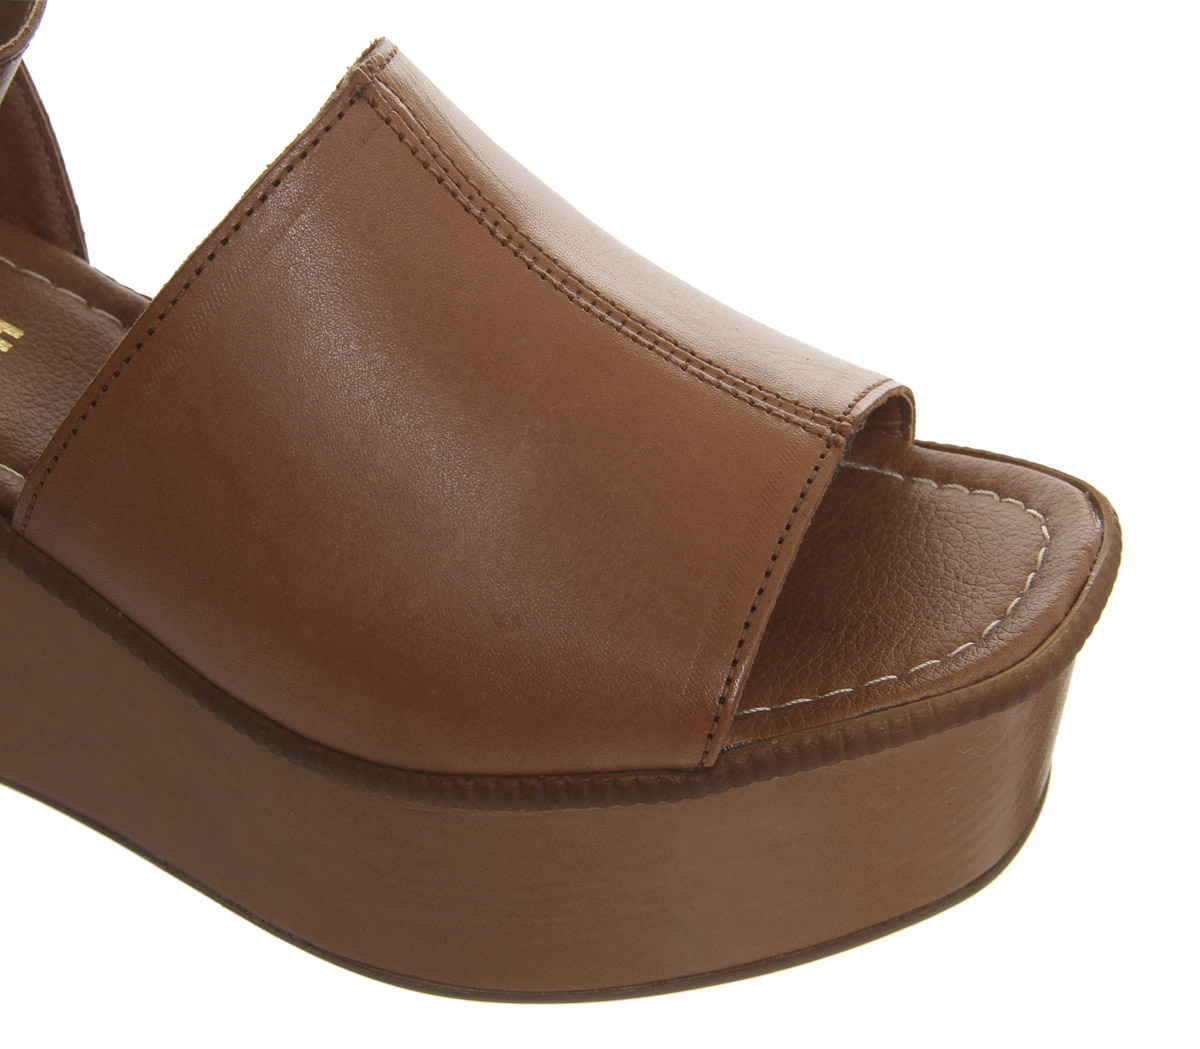 Womens-Office-Money-Honey-Wedges-Tan-Leather-Heels thumbnail 10